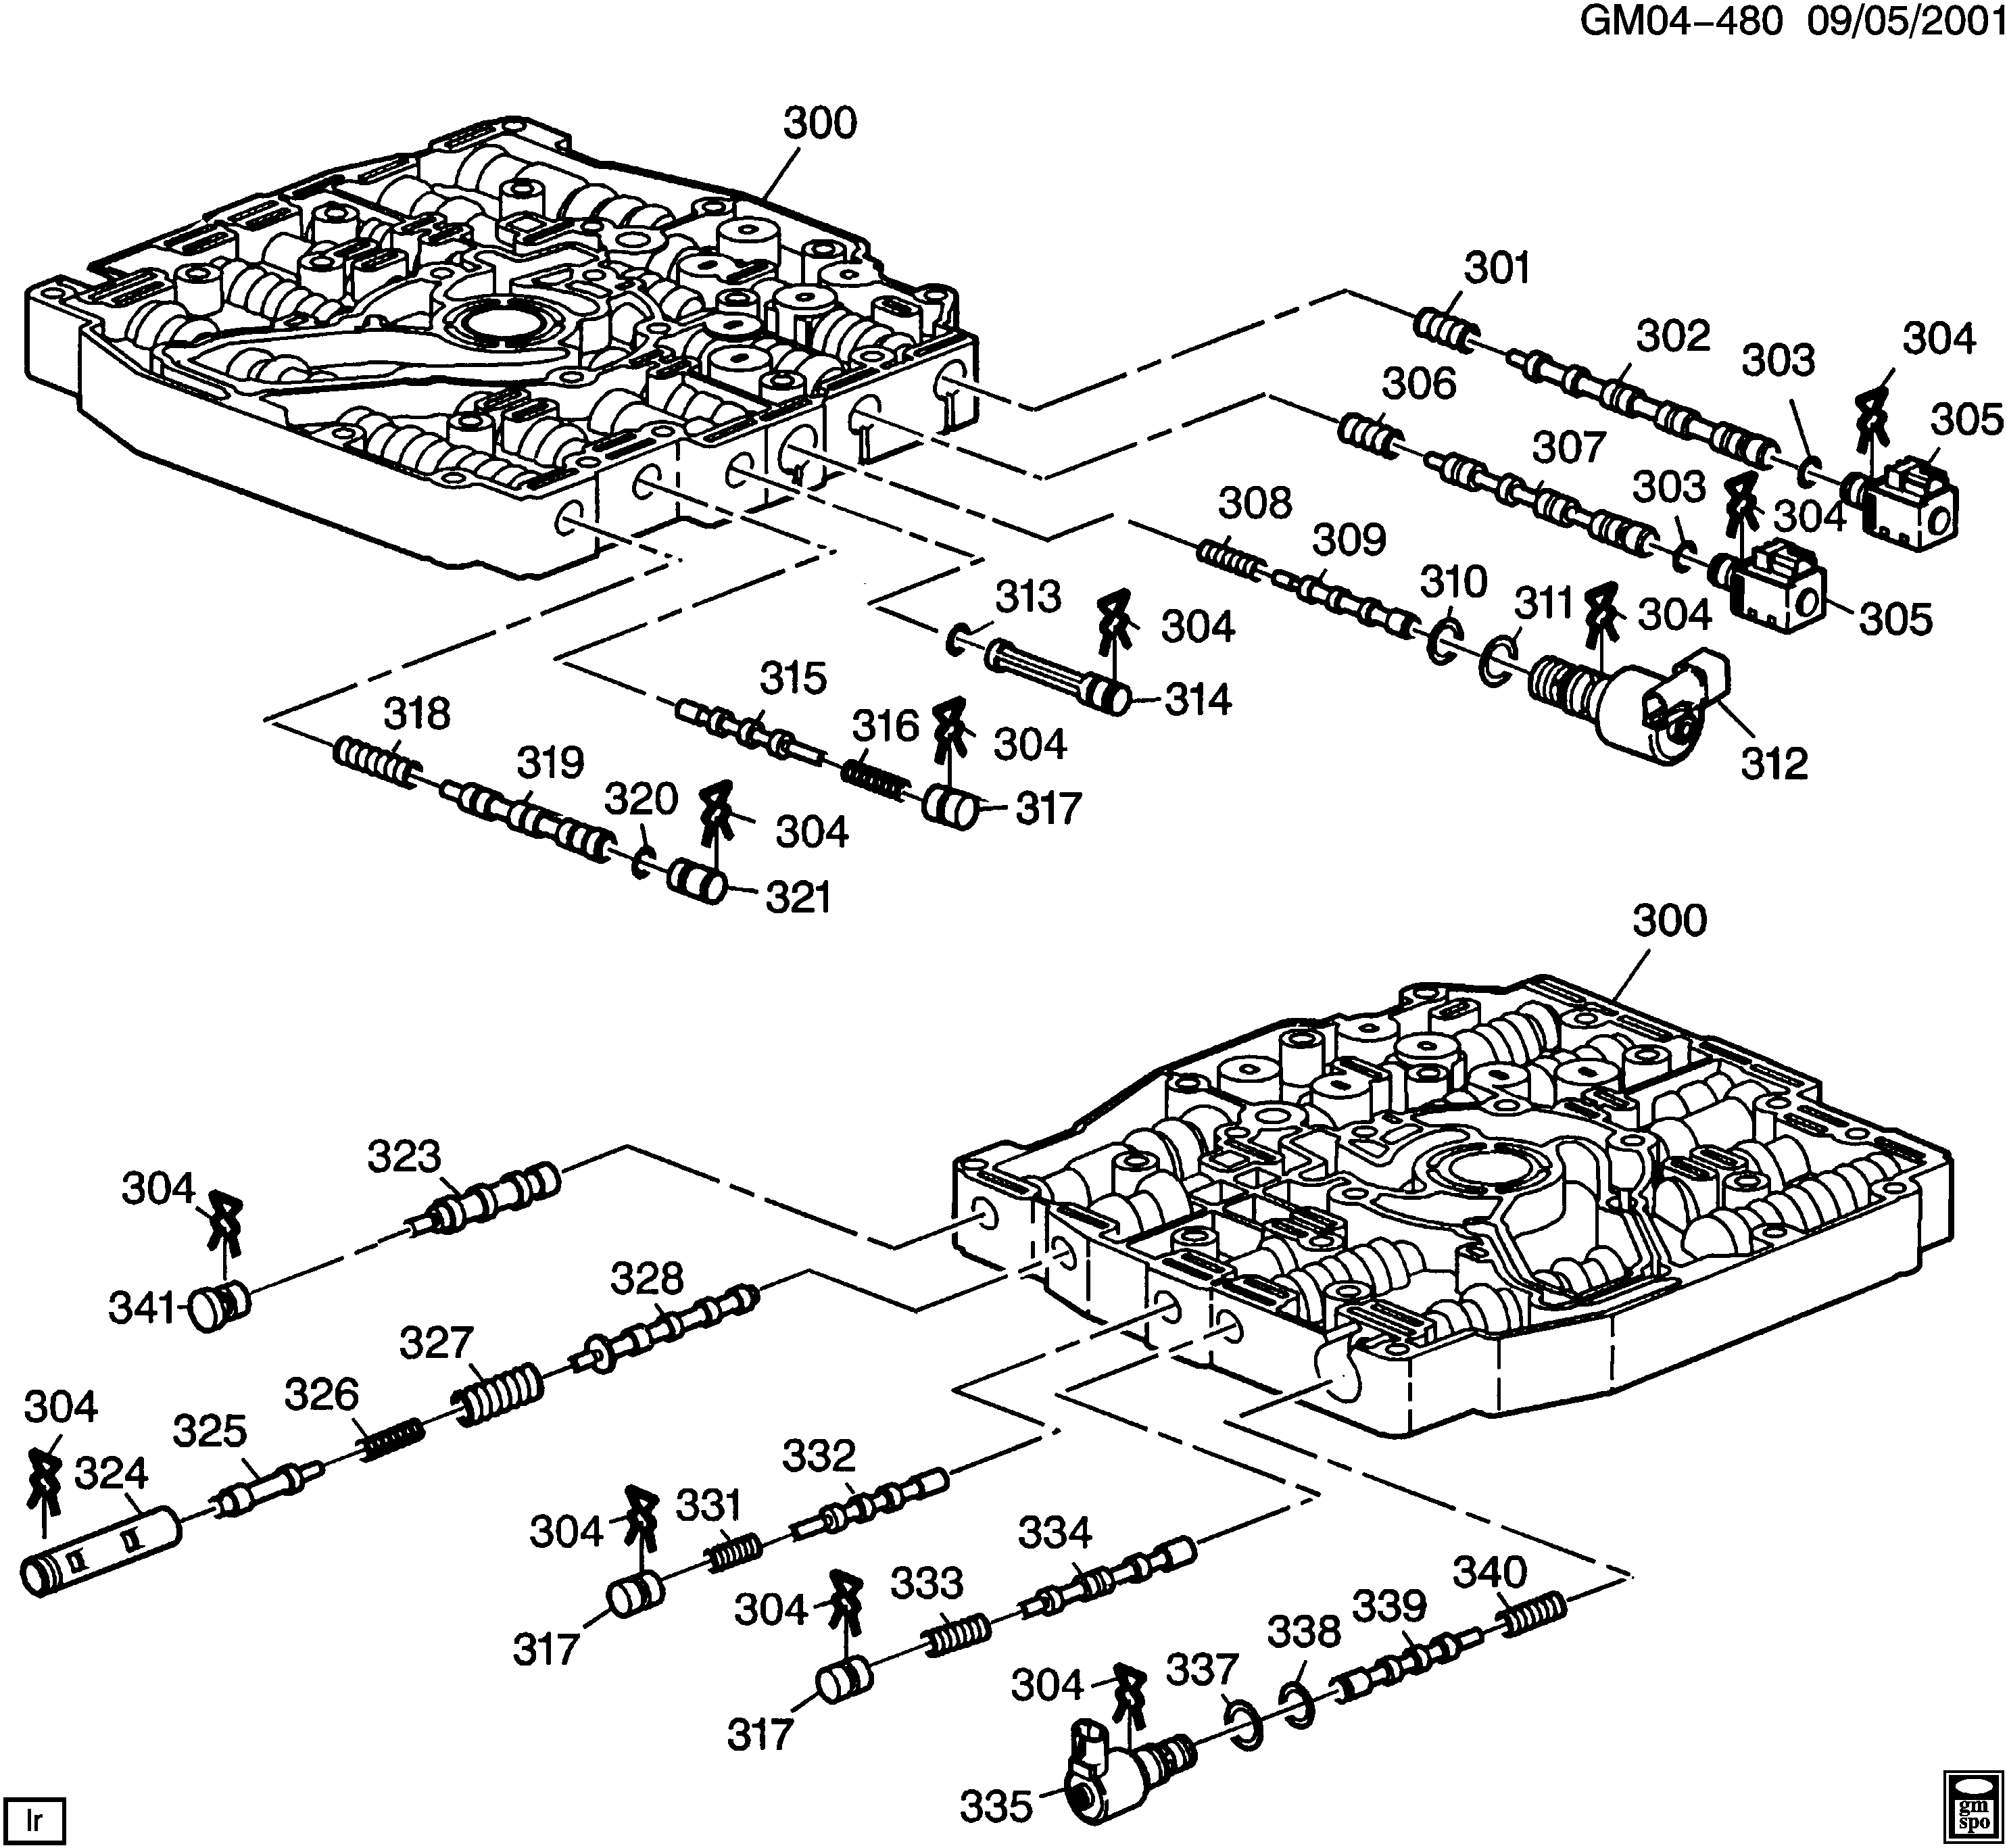 40t400e Diagram   Diagram & Symbol Wiring schematic chaos ...